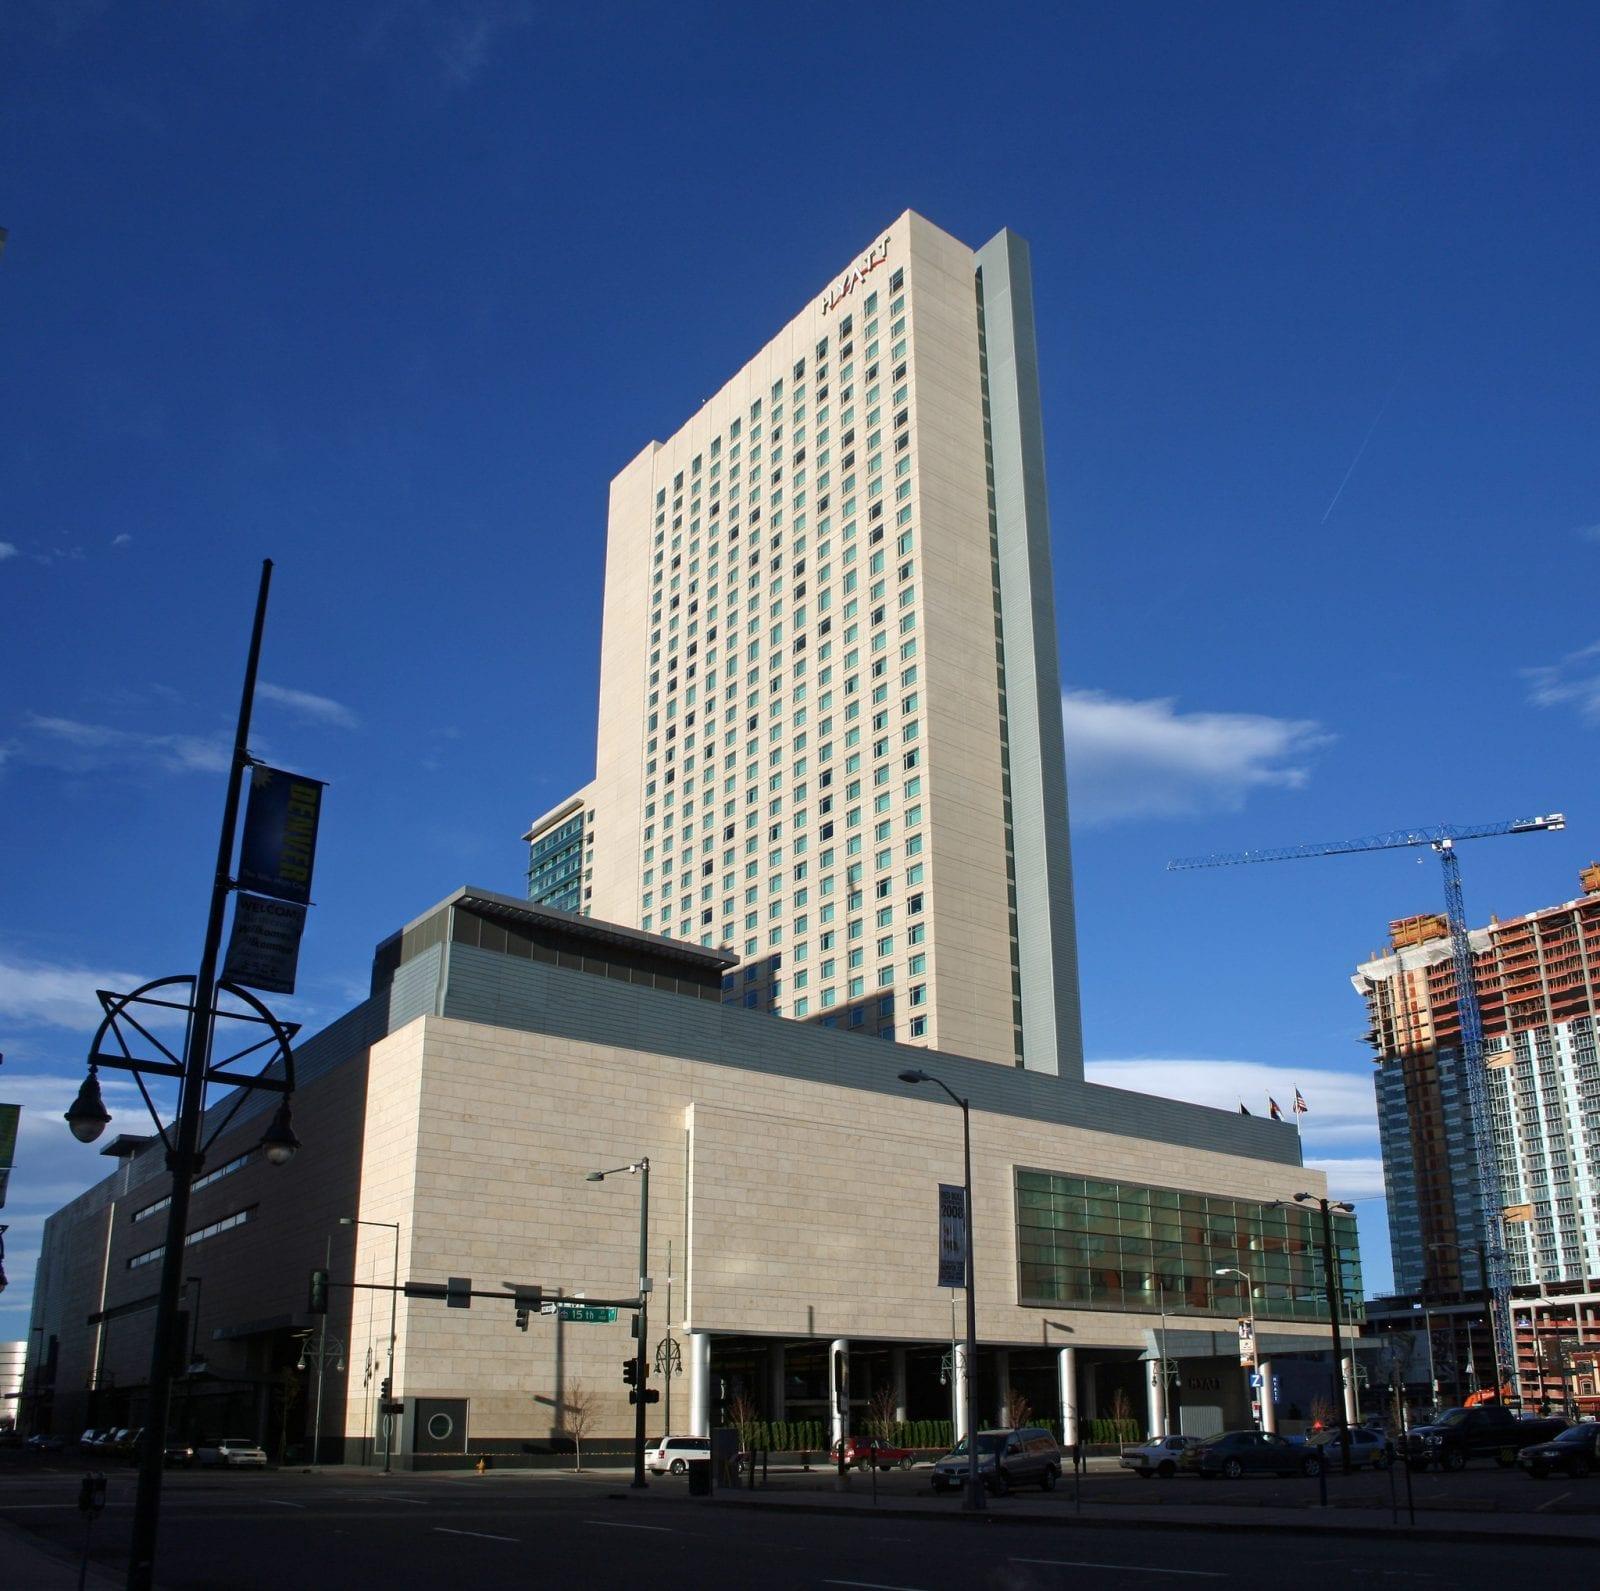 Image of the Hyatt Regency in Denver, Colorado